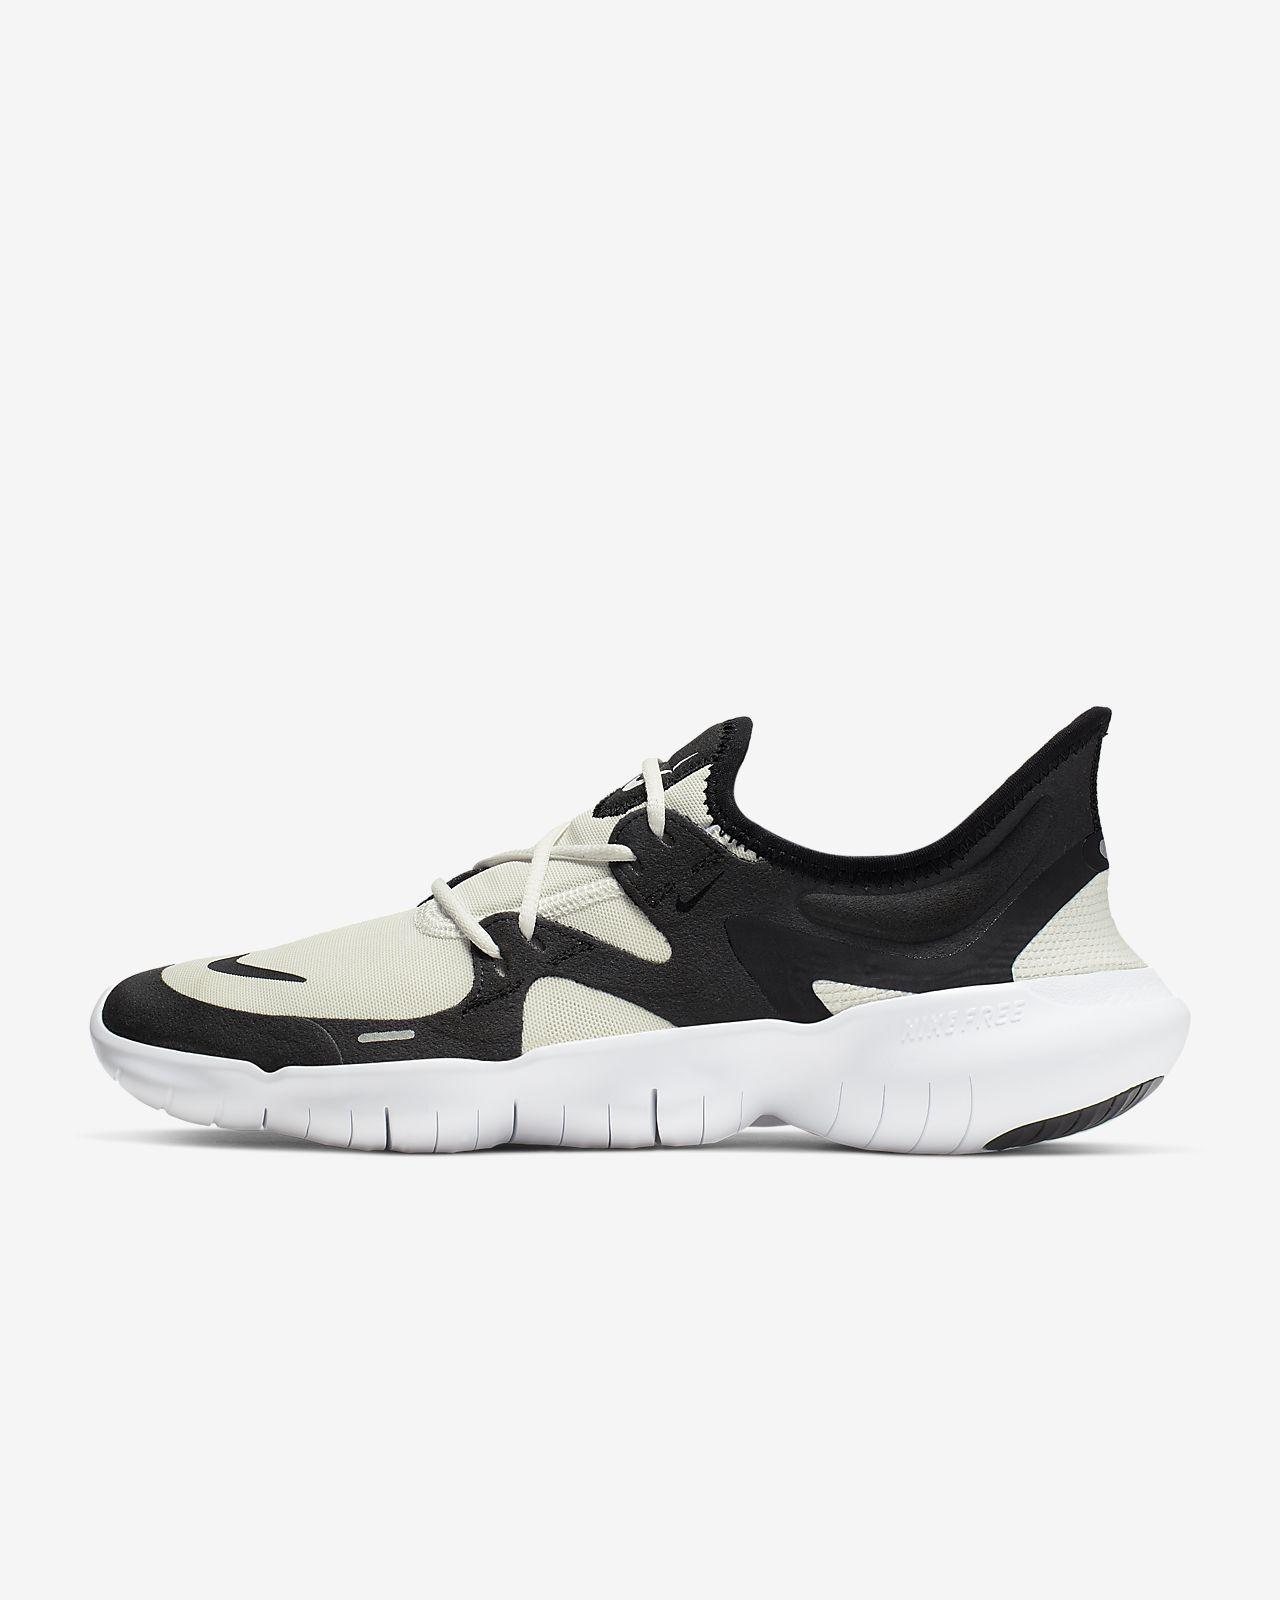 Nike Free RN 5.0 Zapatillas de running - Mujer